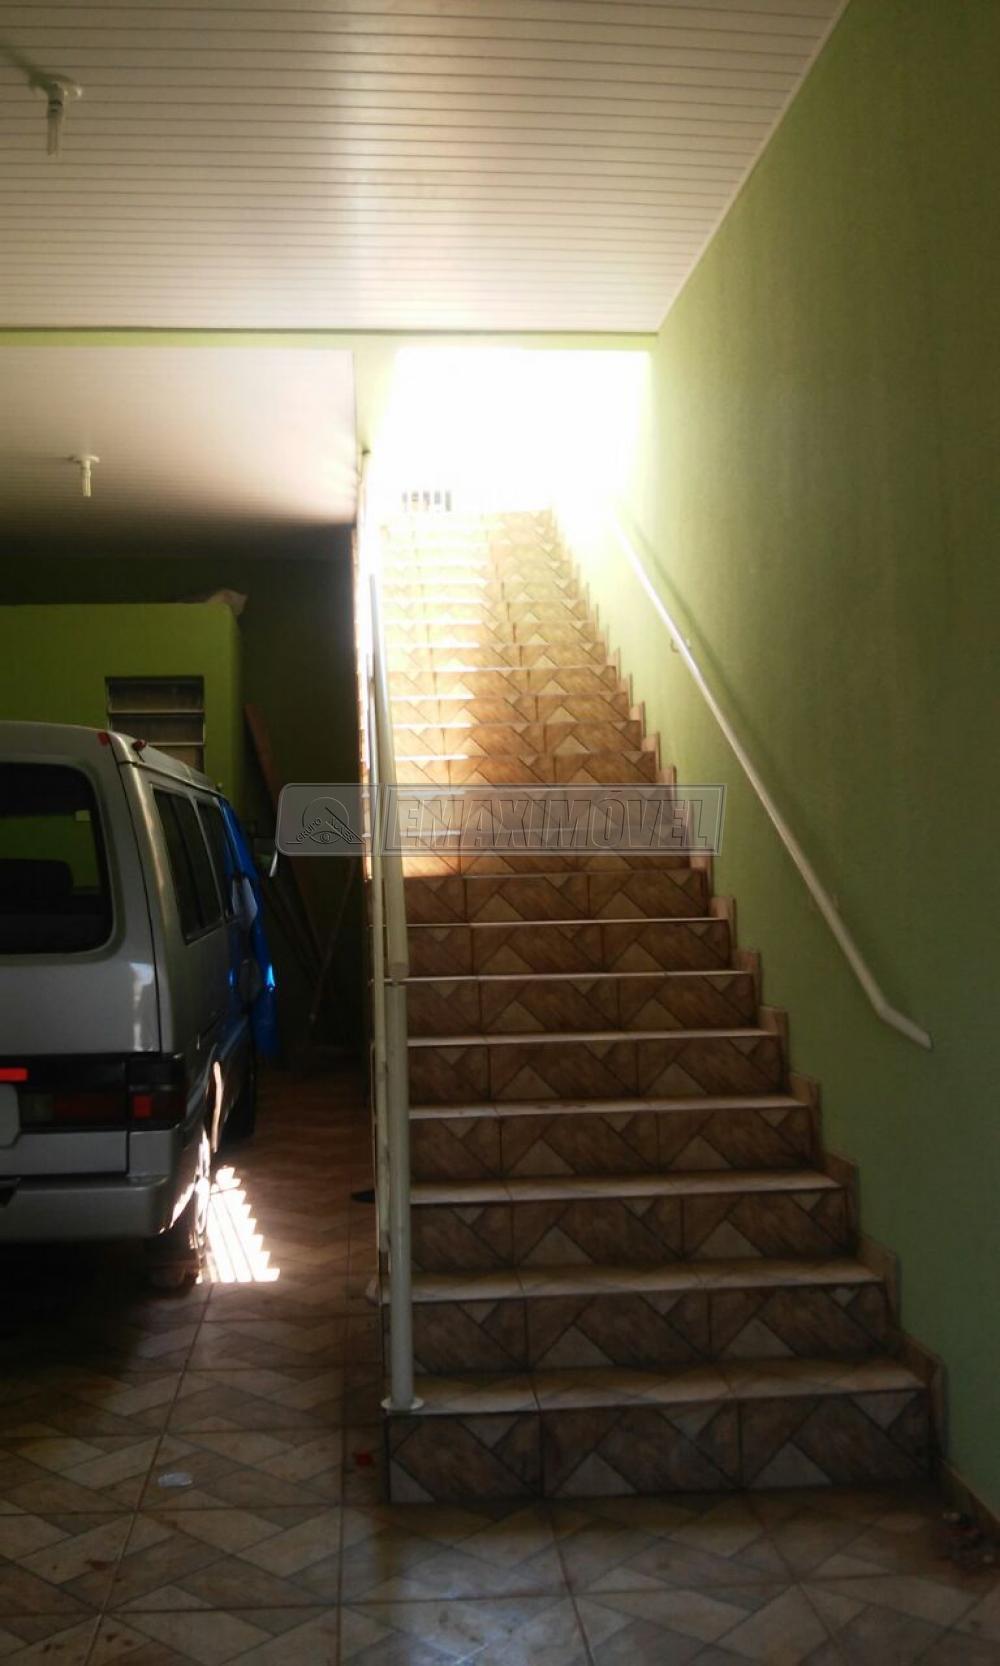 Comprar Comercial / Prédios em Sorocaba R$ 950.000,00 - Foto 2